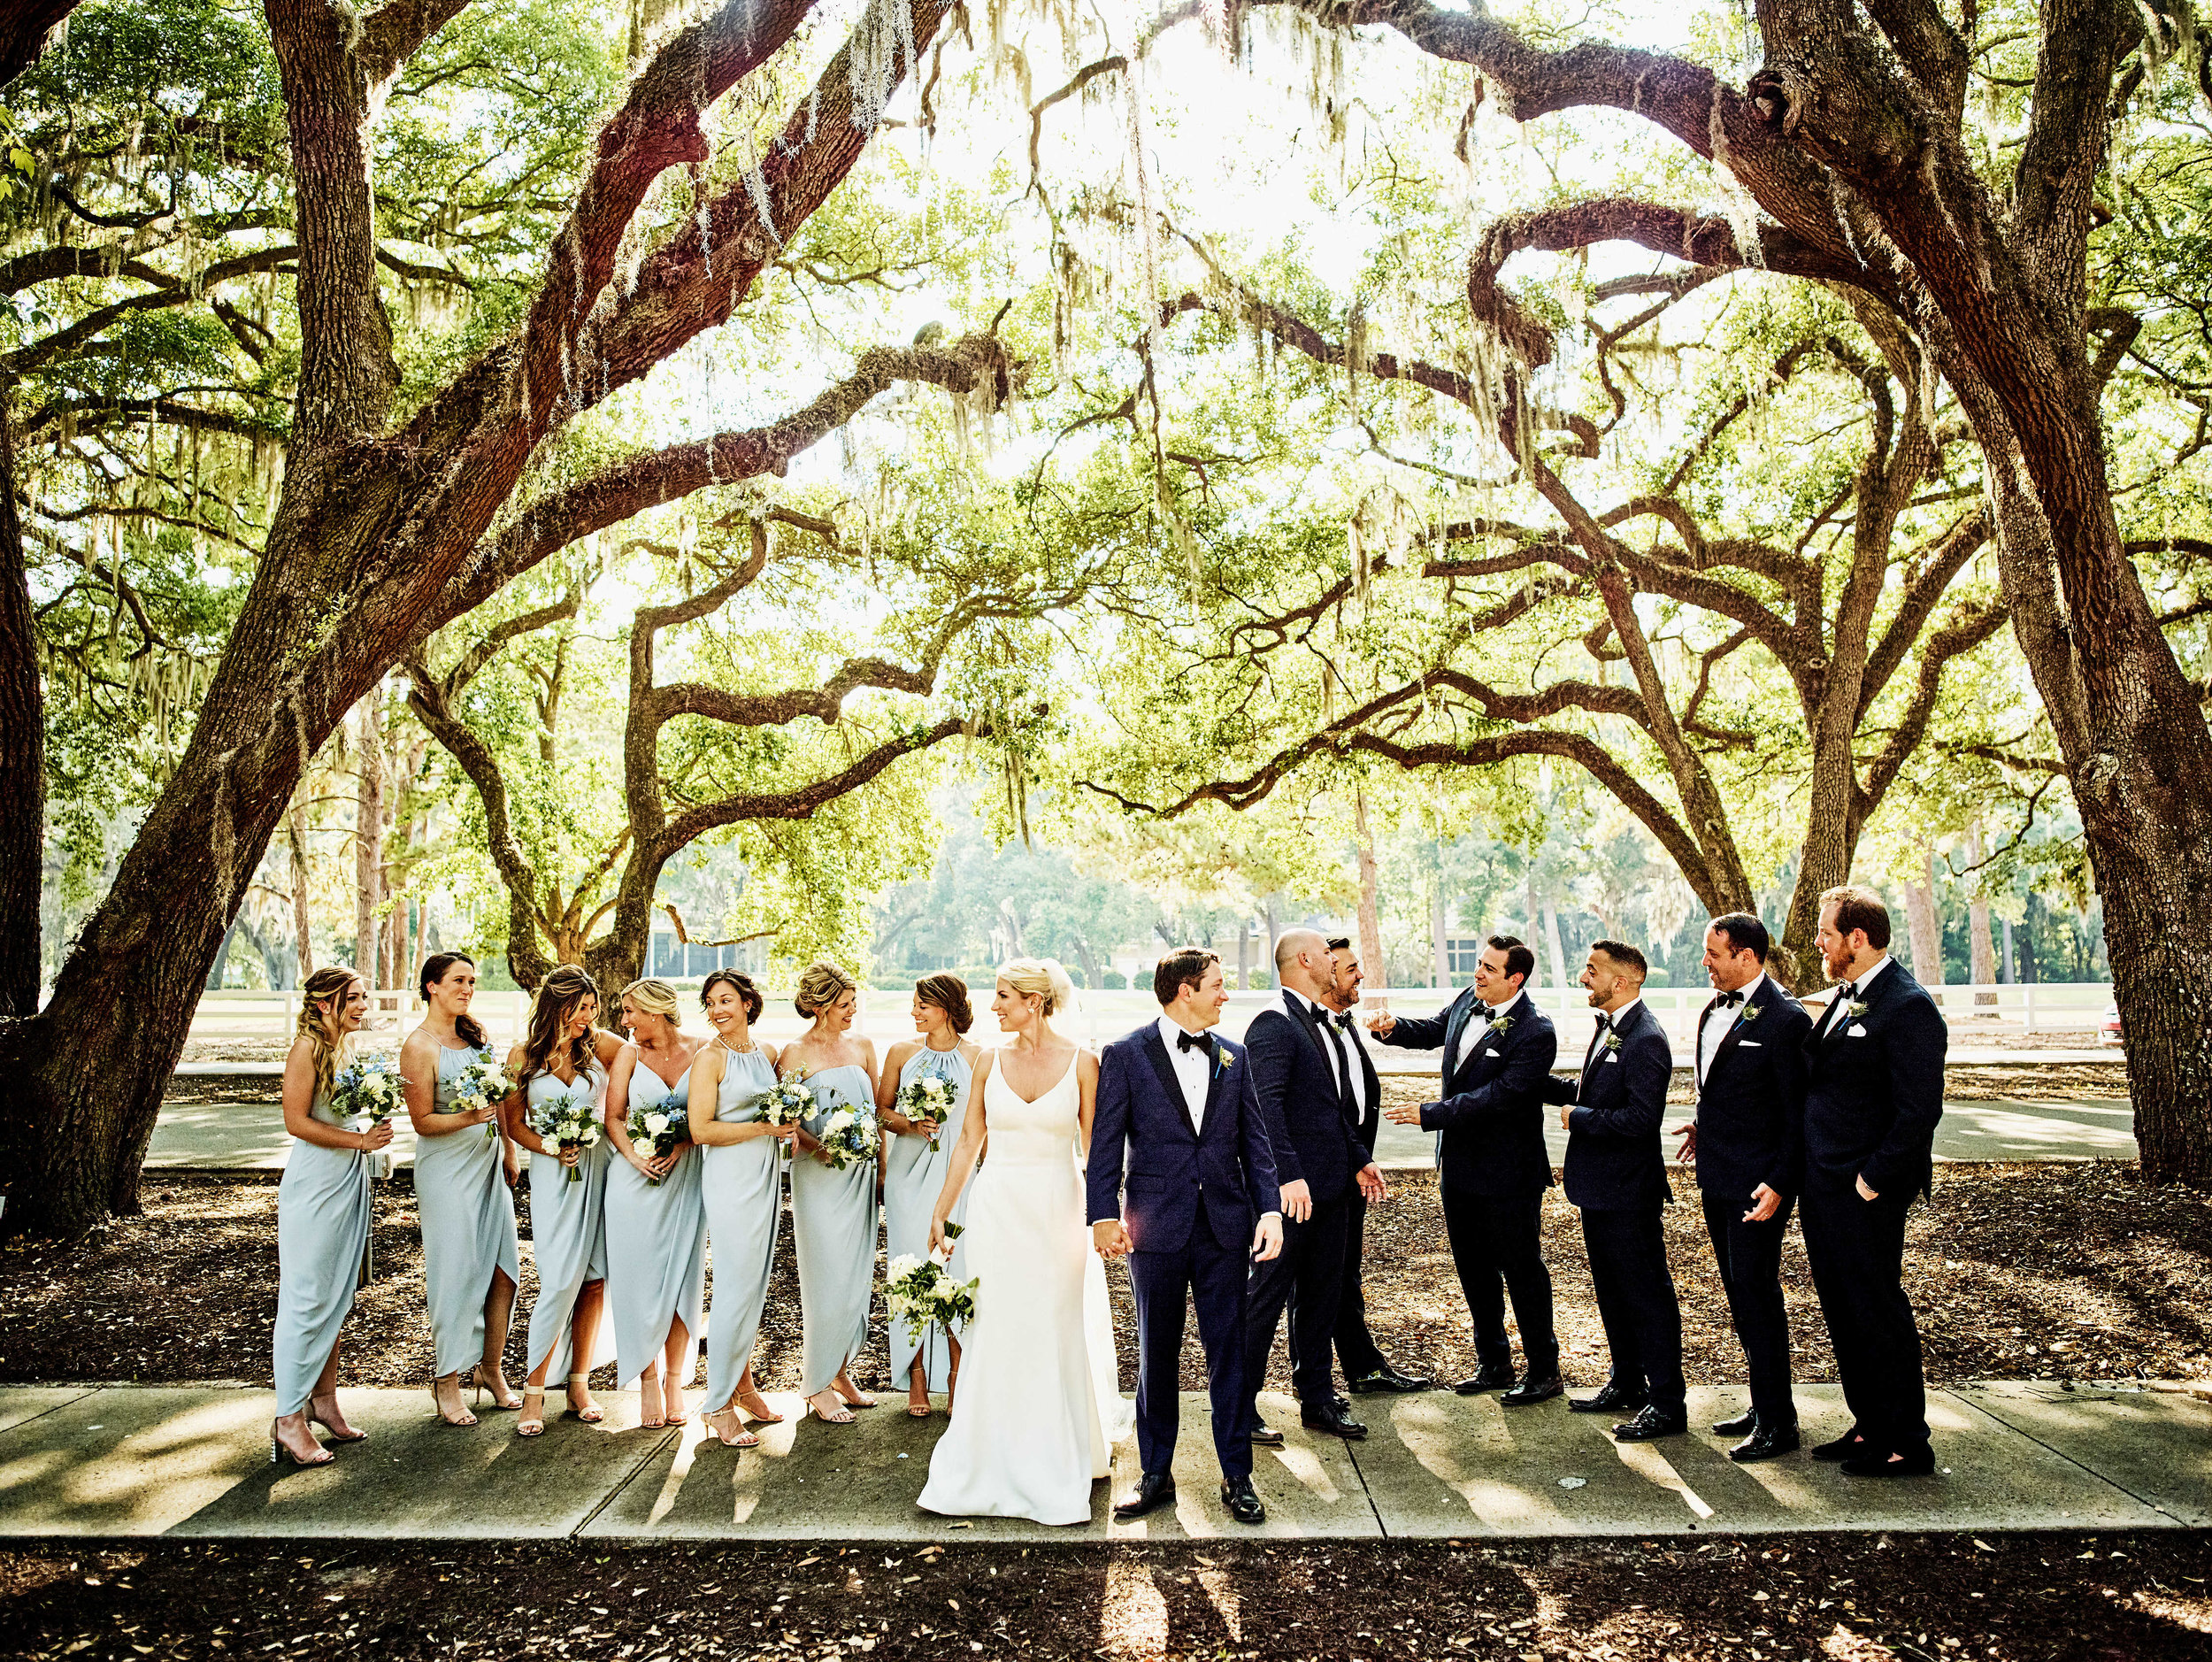 Annie-and-greg-wedding-belfair-plantation-classic-summer-timeless-elegant-bridal-party-groom-bride-couple-love-friends-family-bridal.jpg